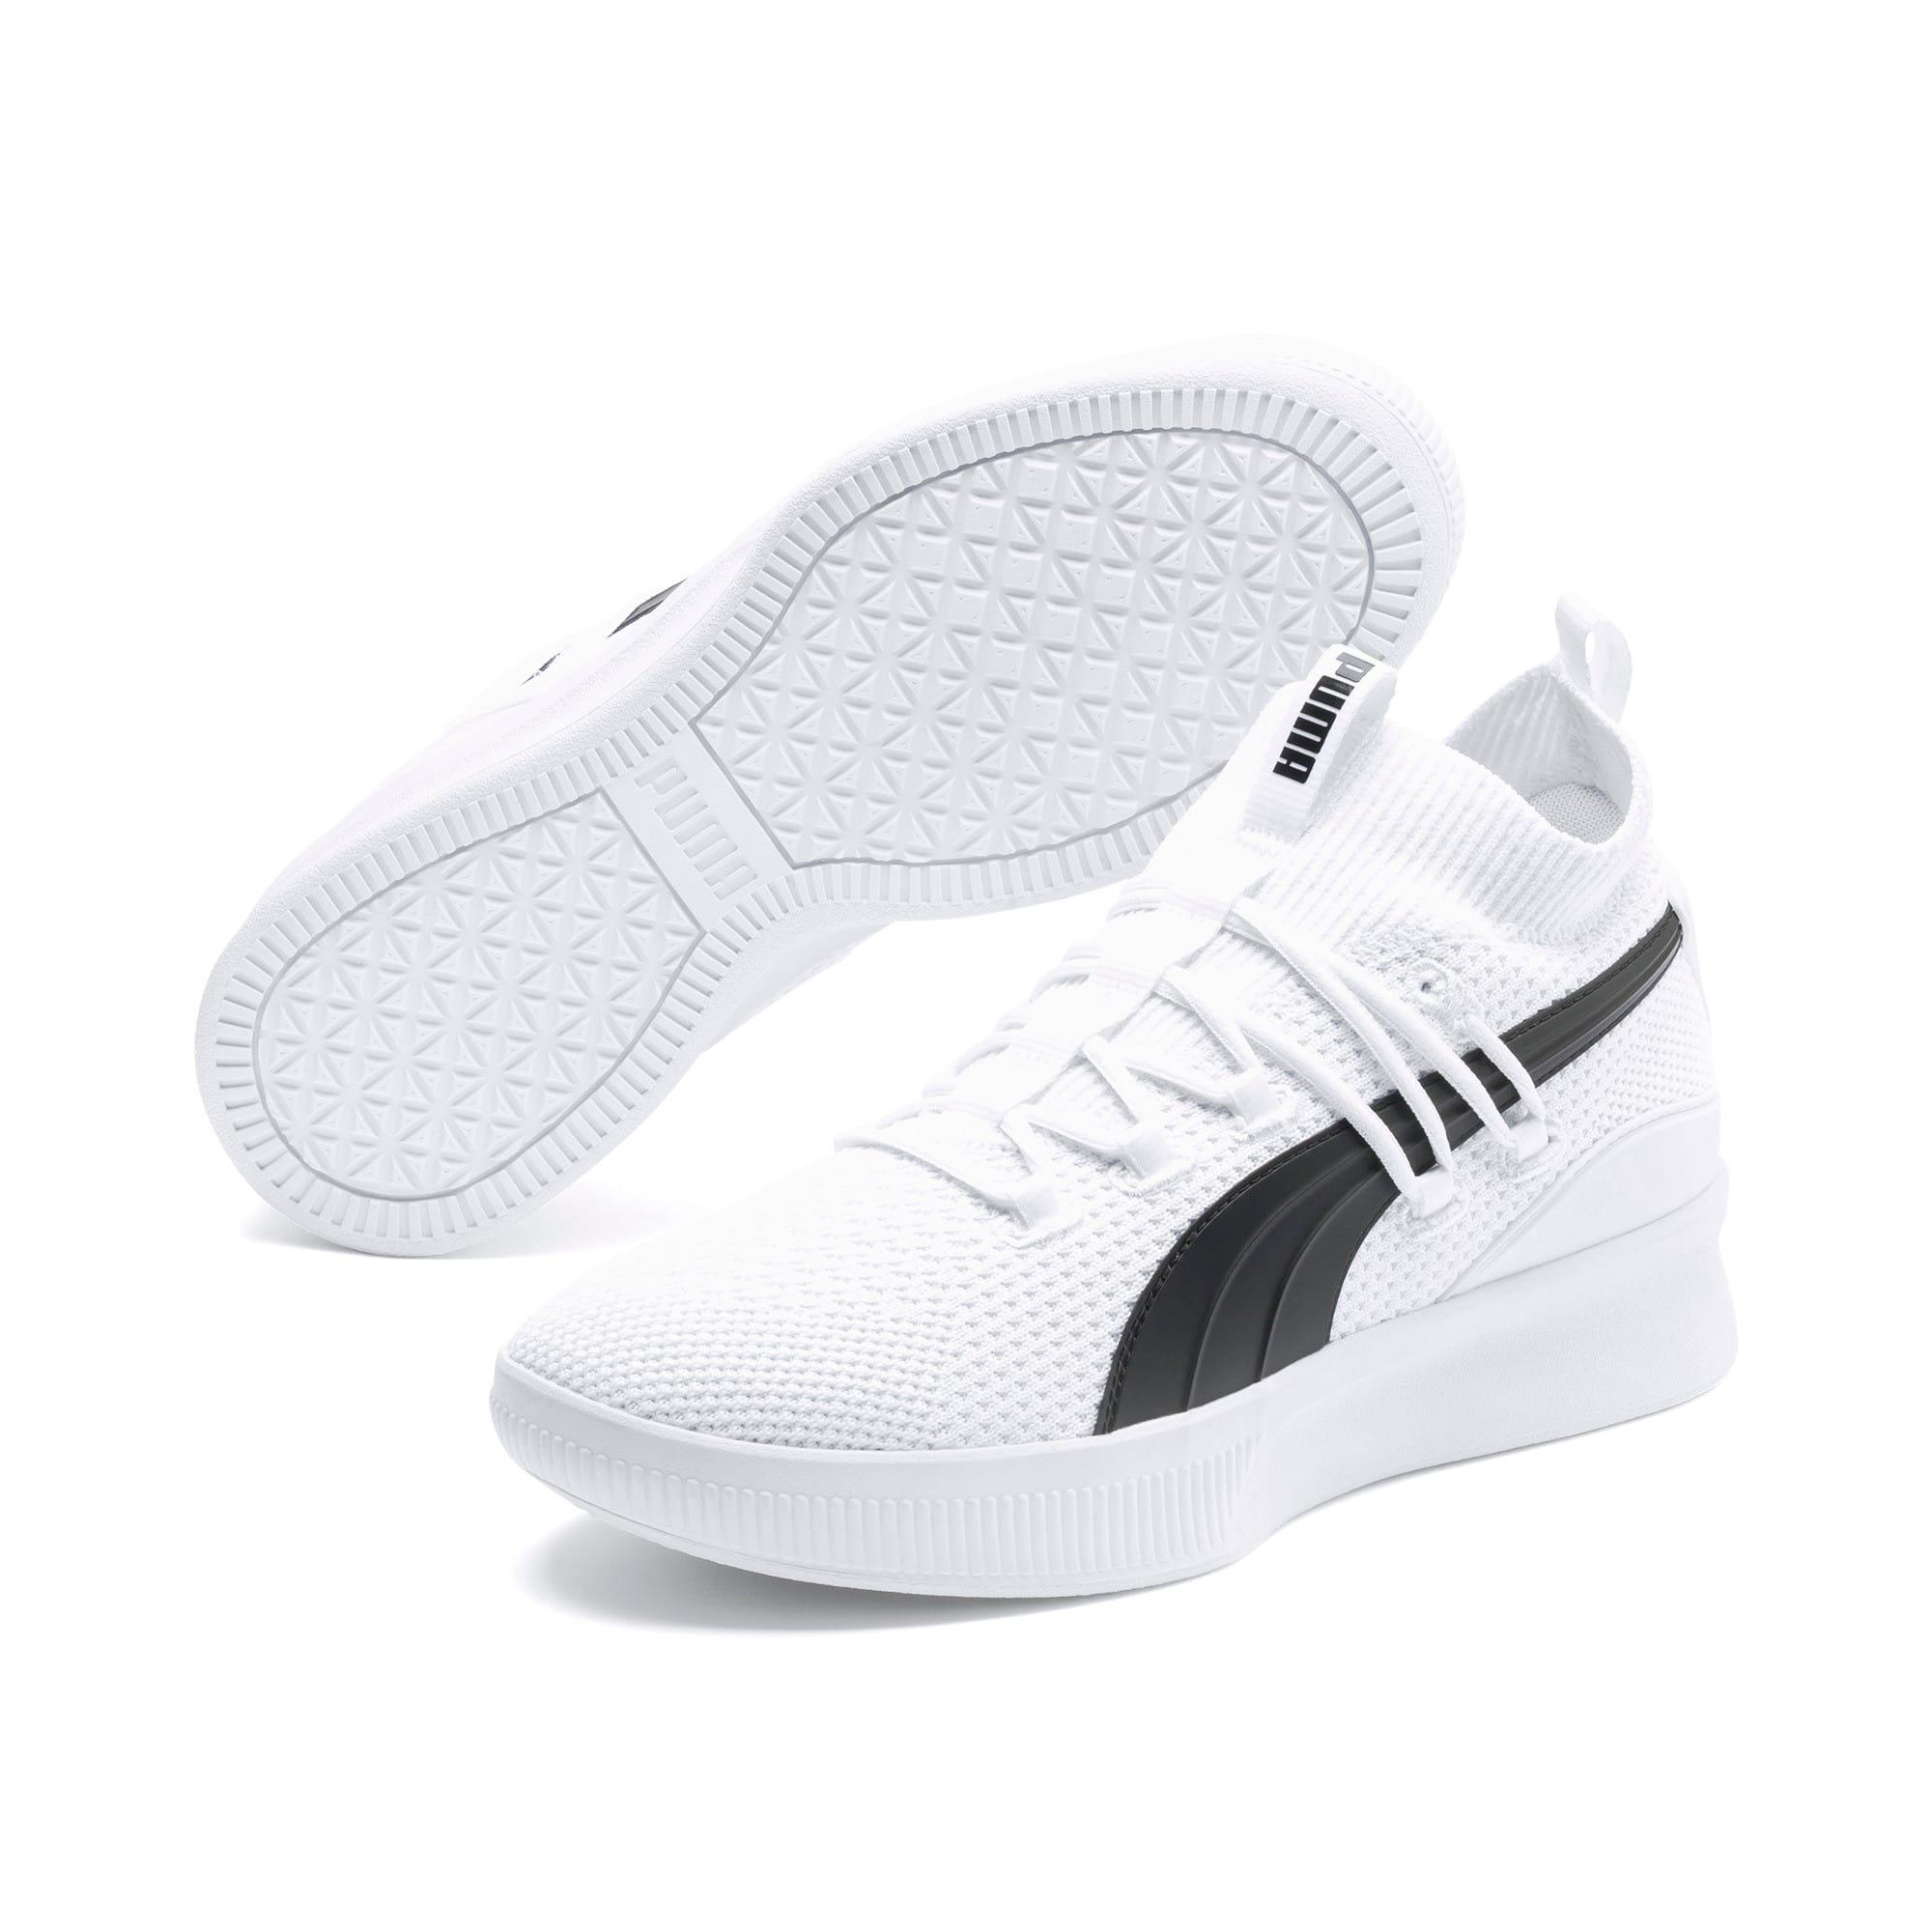 Thumbnail 2 of Chaussure de basket Clyde Court, Puma White, medium